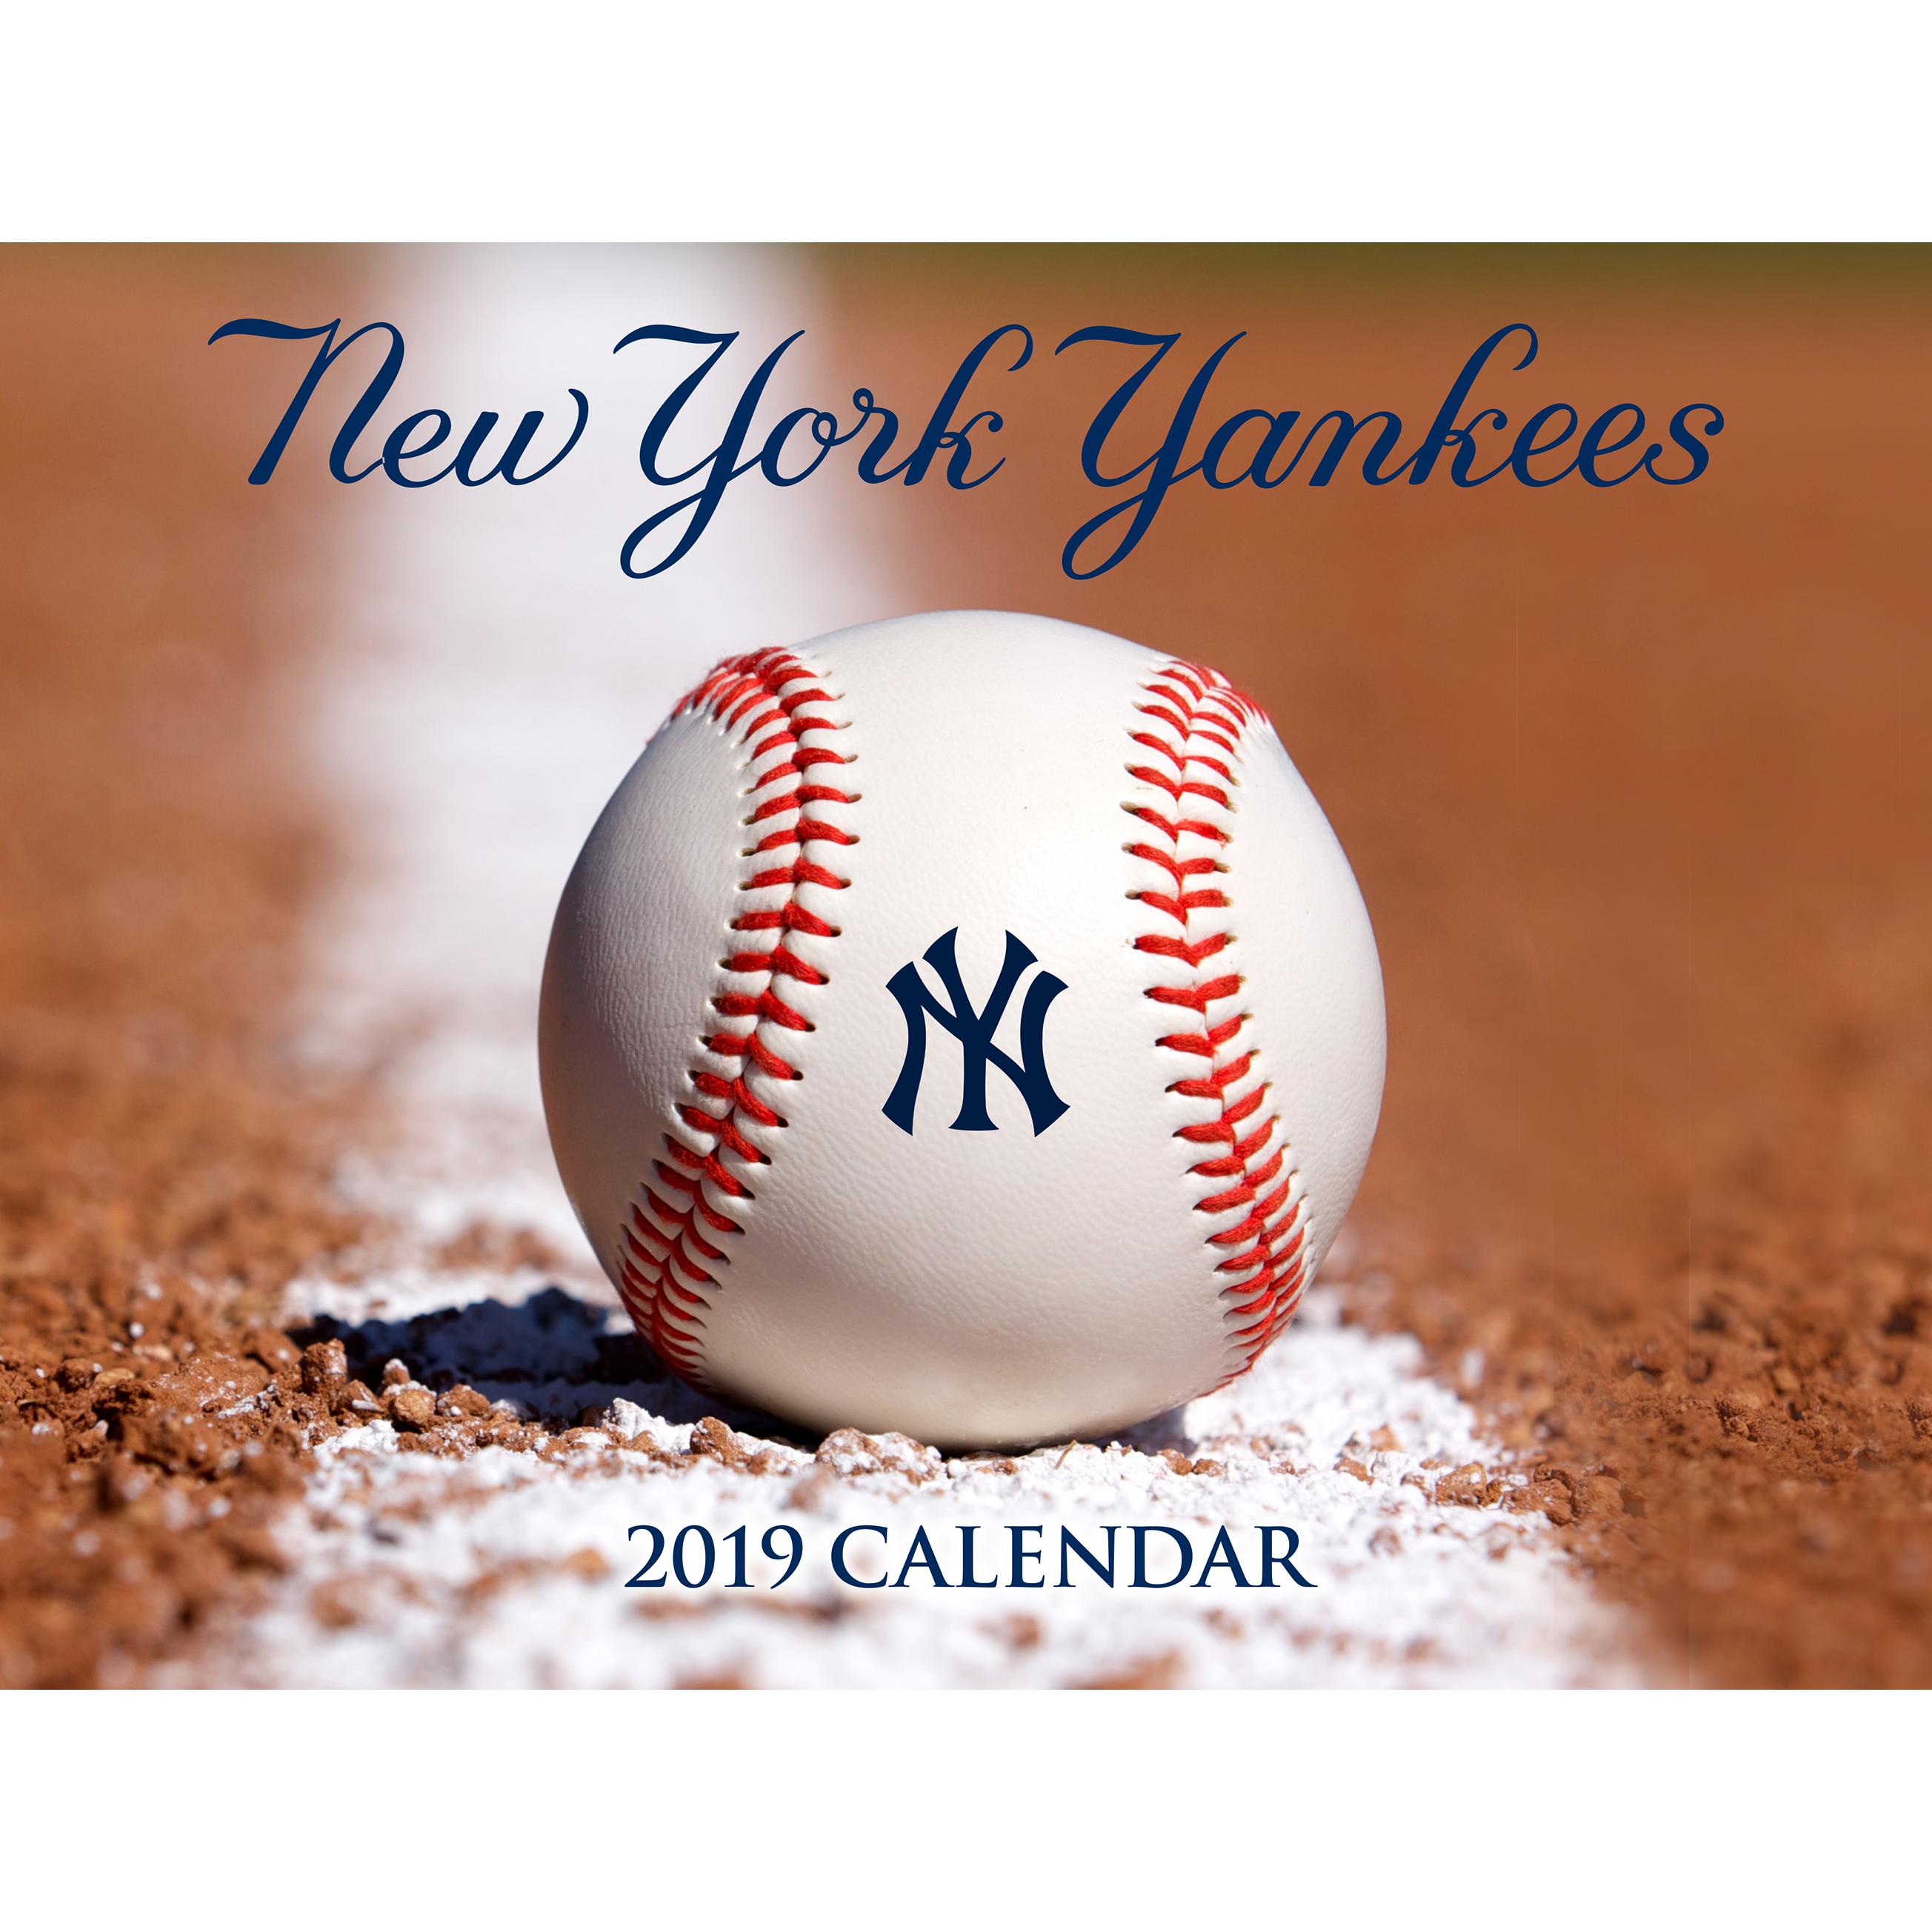 New York Yankees Schedule New York Yankees New York Yankees Yankees Yankees Schedule